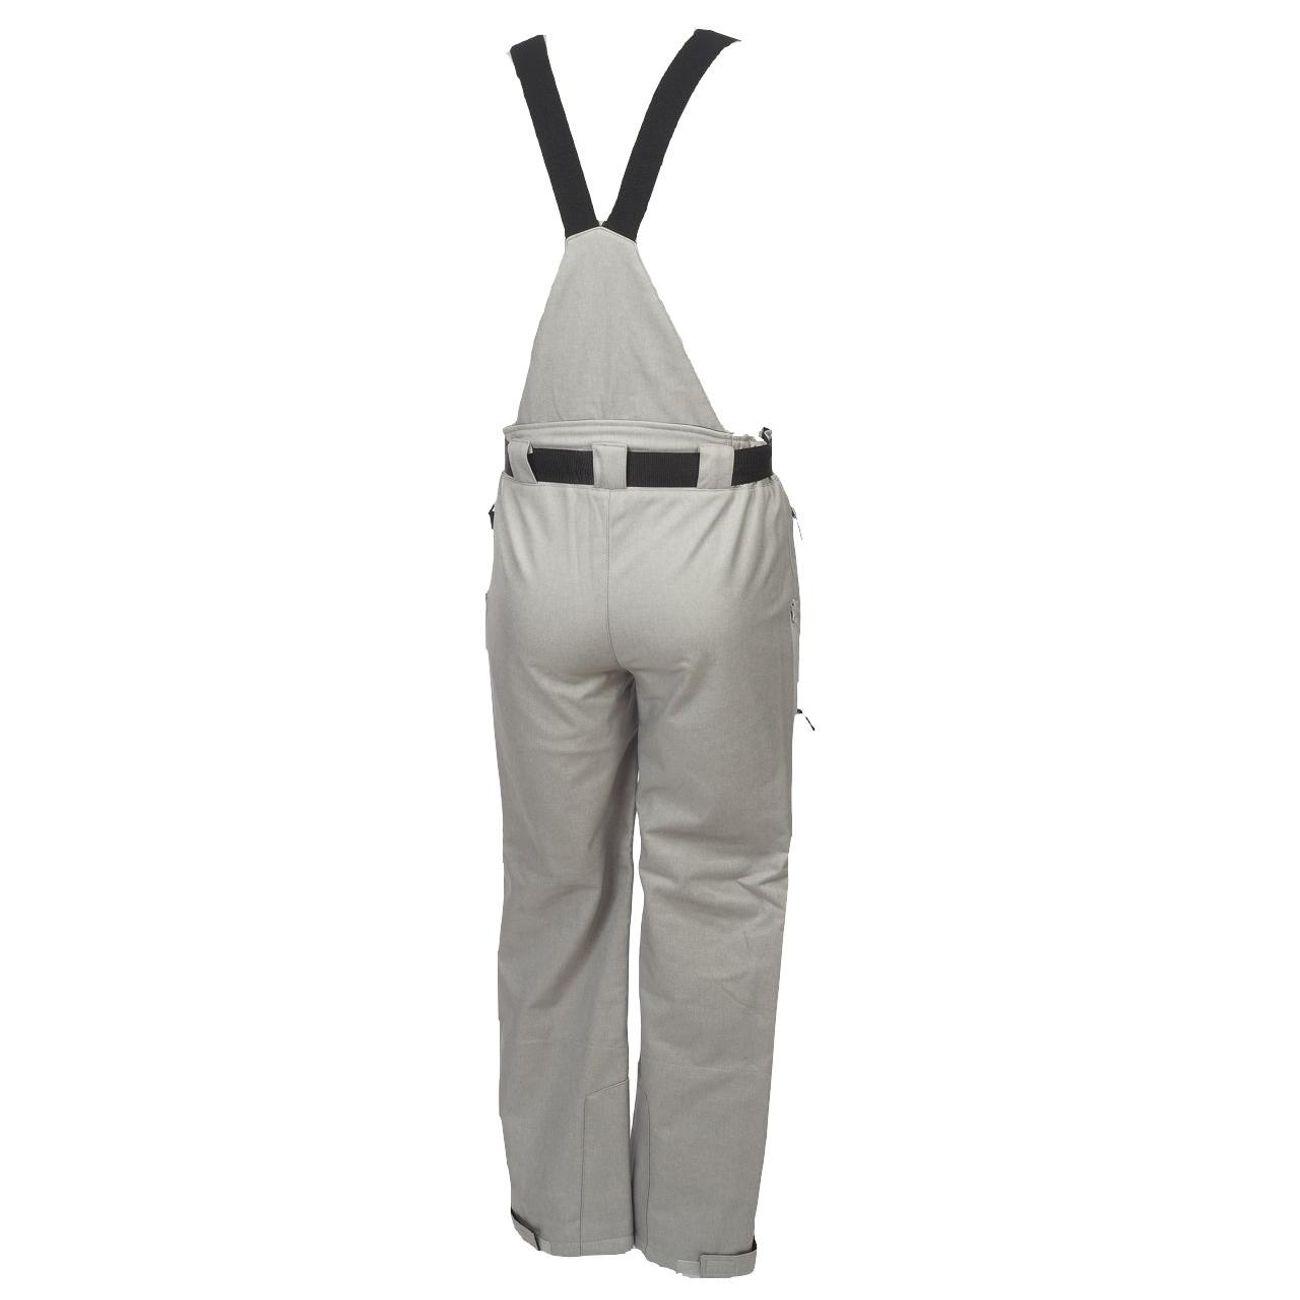 Ski homme Eldera sportswear Unosoft gris ch pant